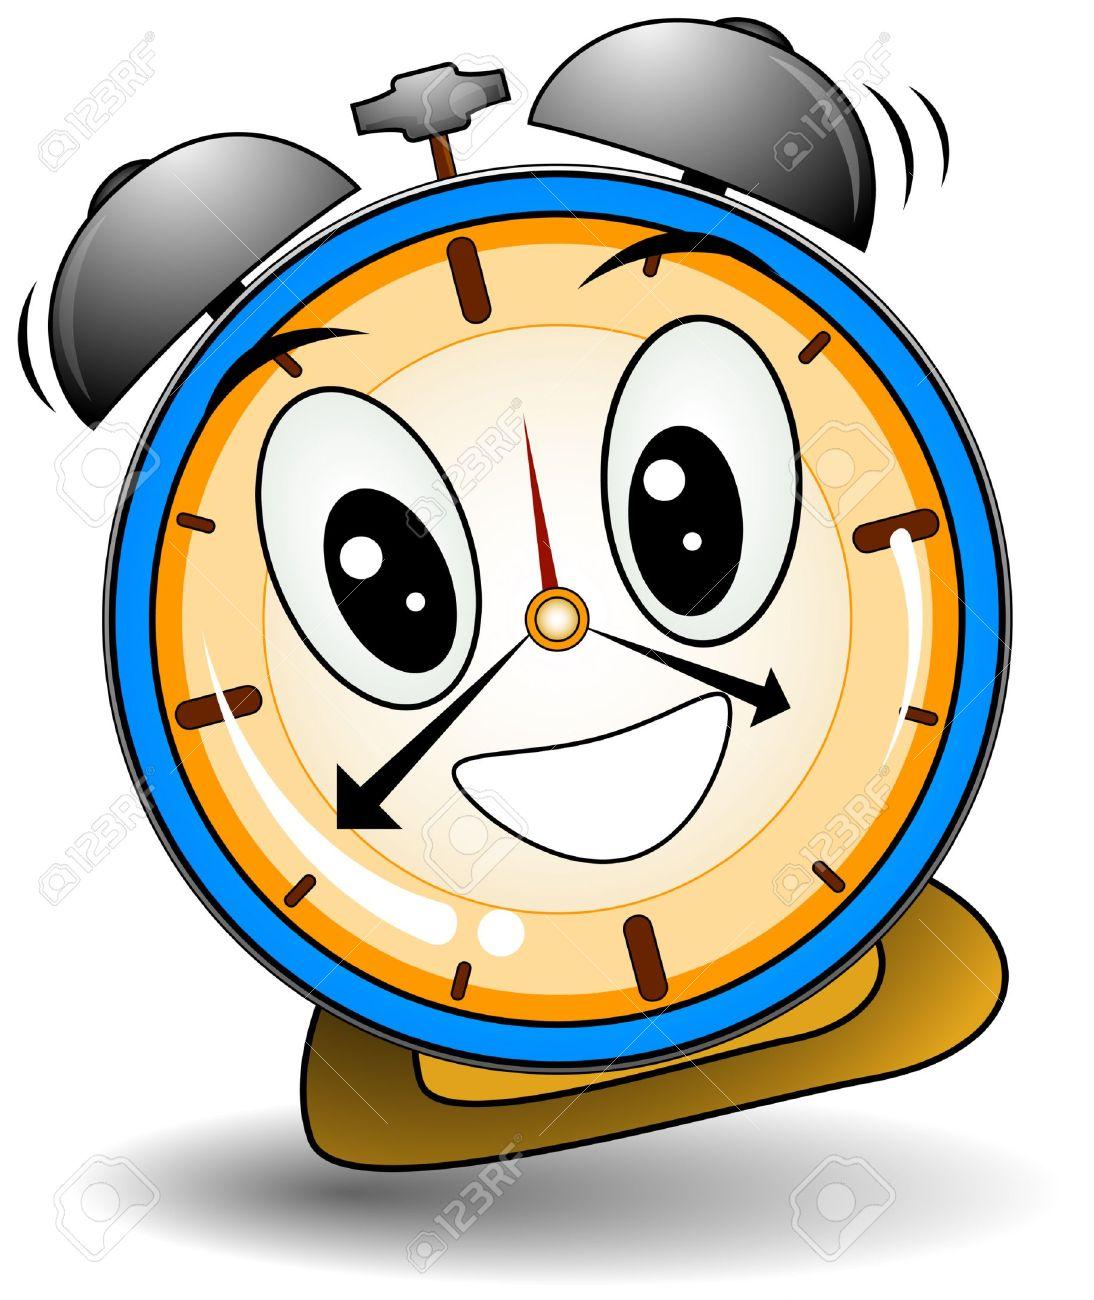 Ringing Alarm Clock Free .